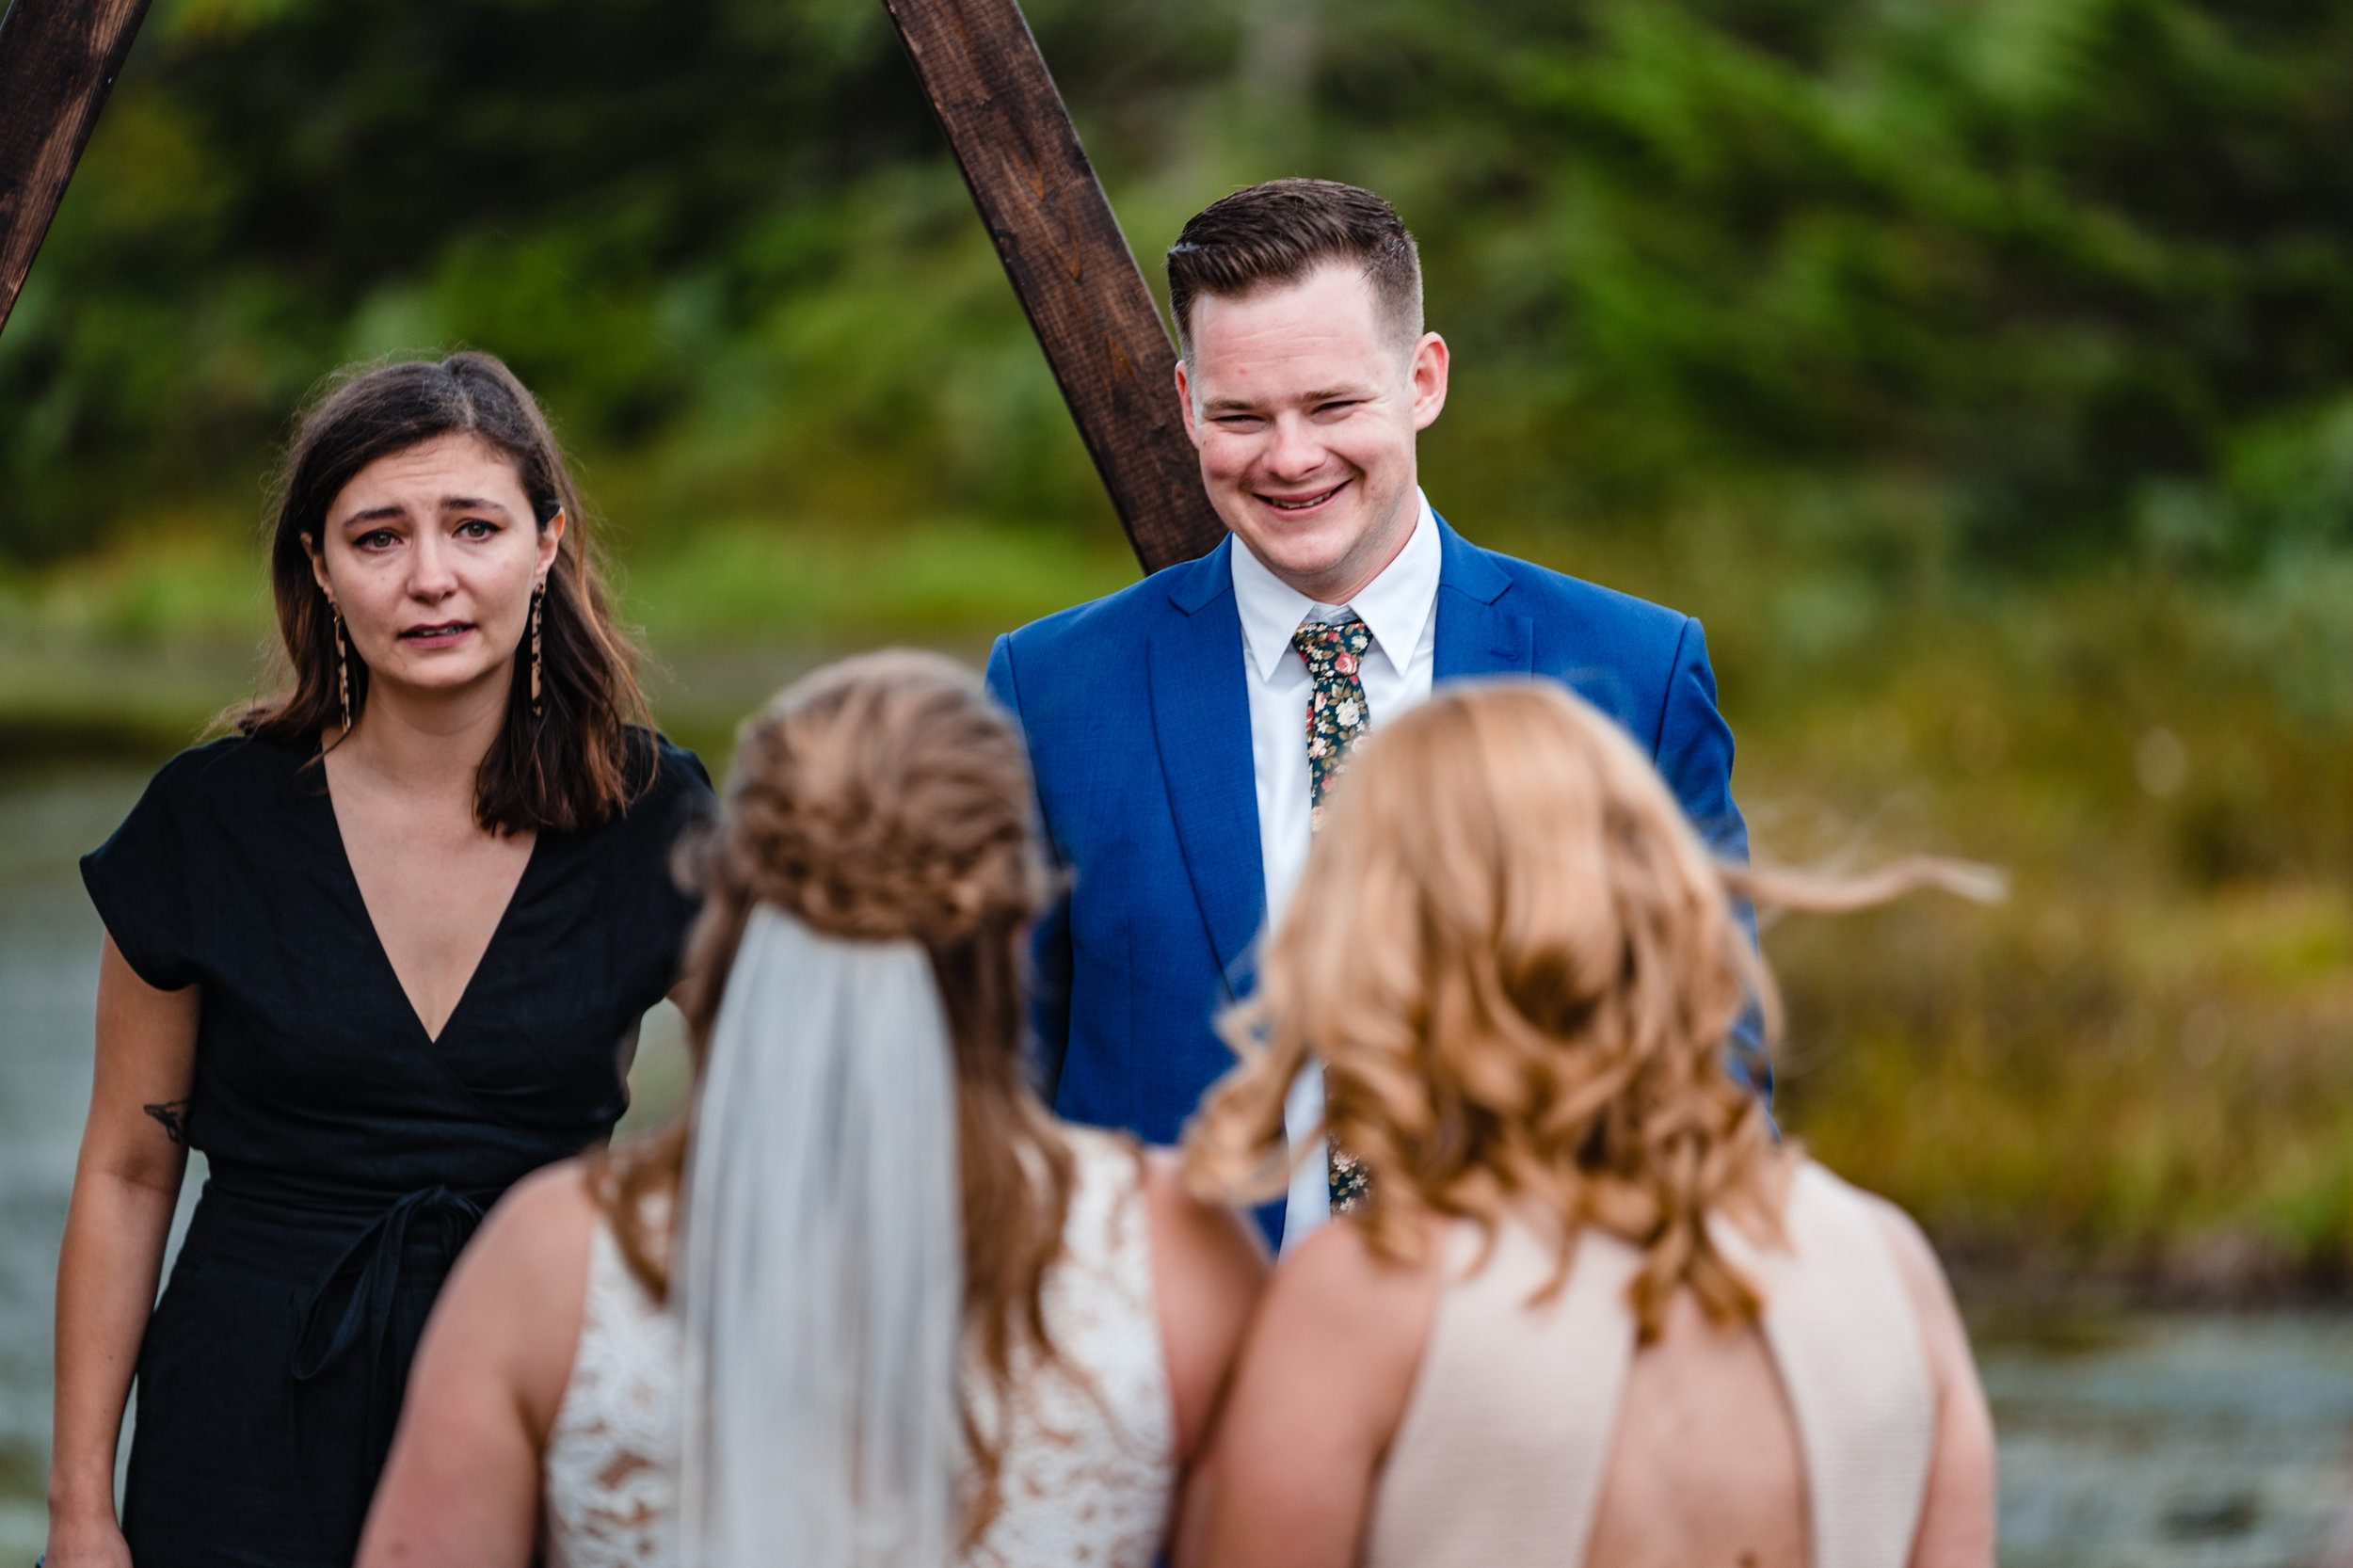 Janelle-Mitch-Halifax-Wedding-Nova-Scotia-Photography (107 of 163).jpg